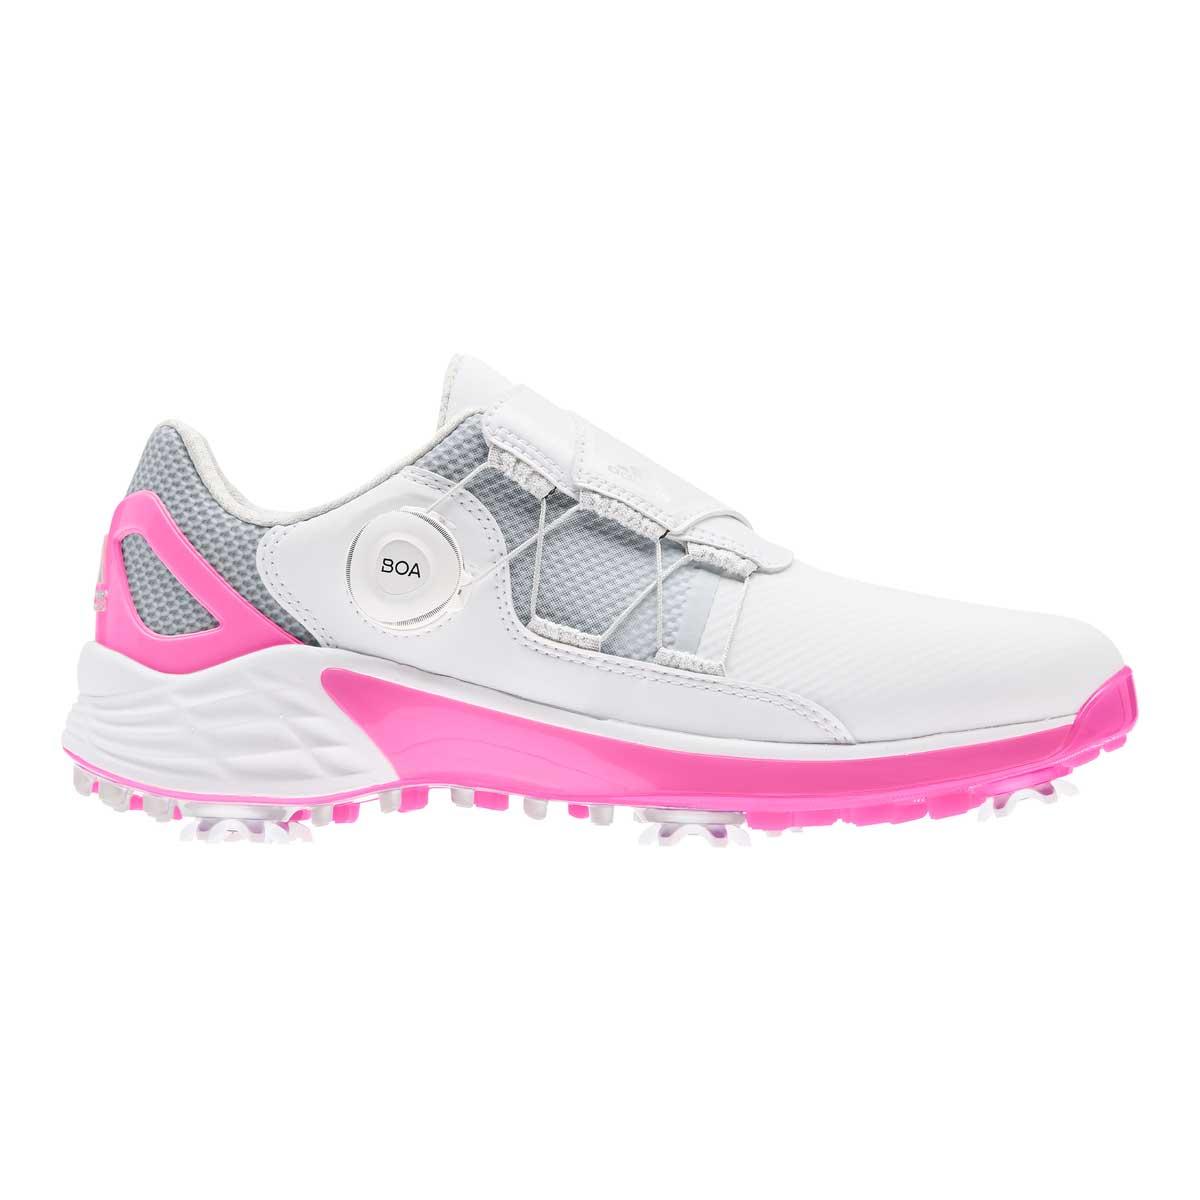 Adidas Women's ZG21 BOA White/Screaming Pink Golf Shoe